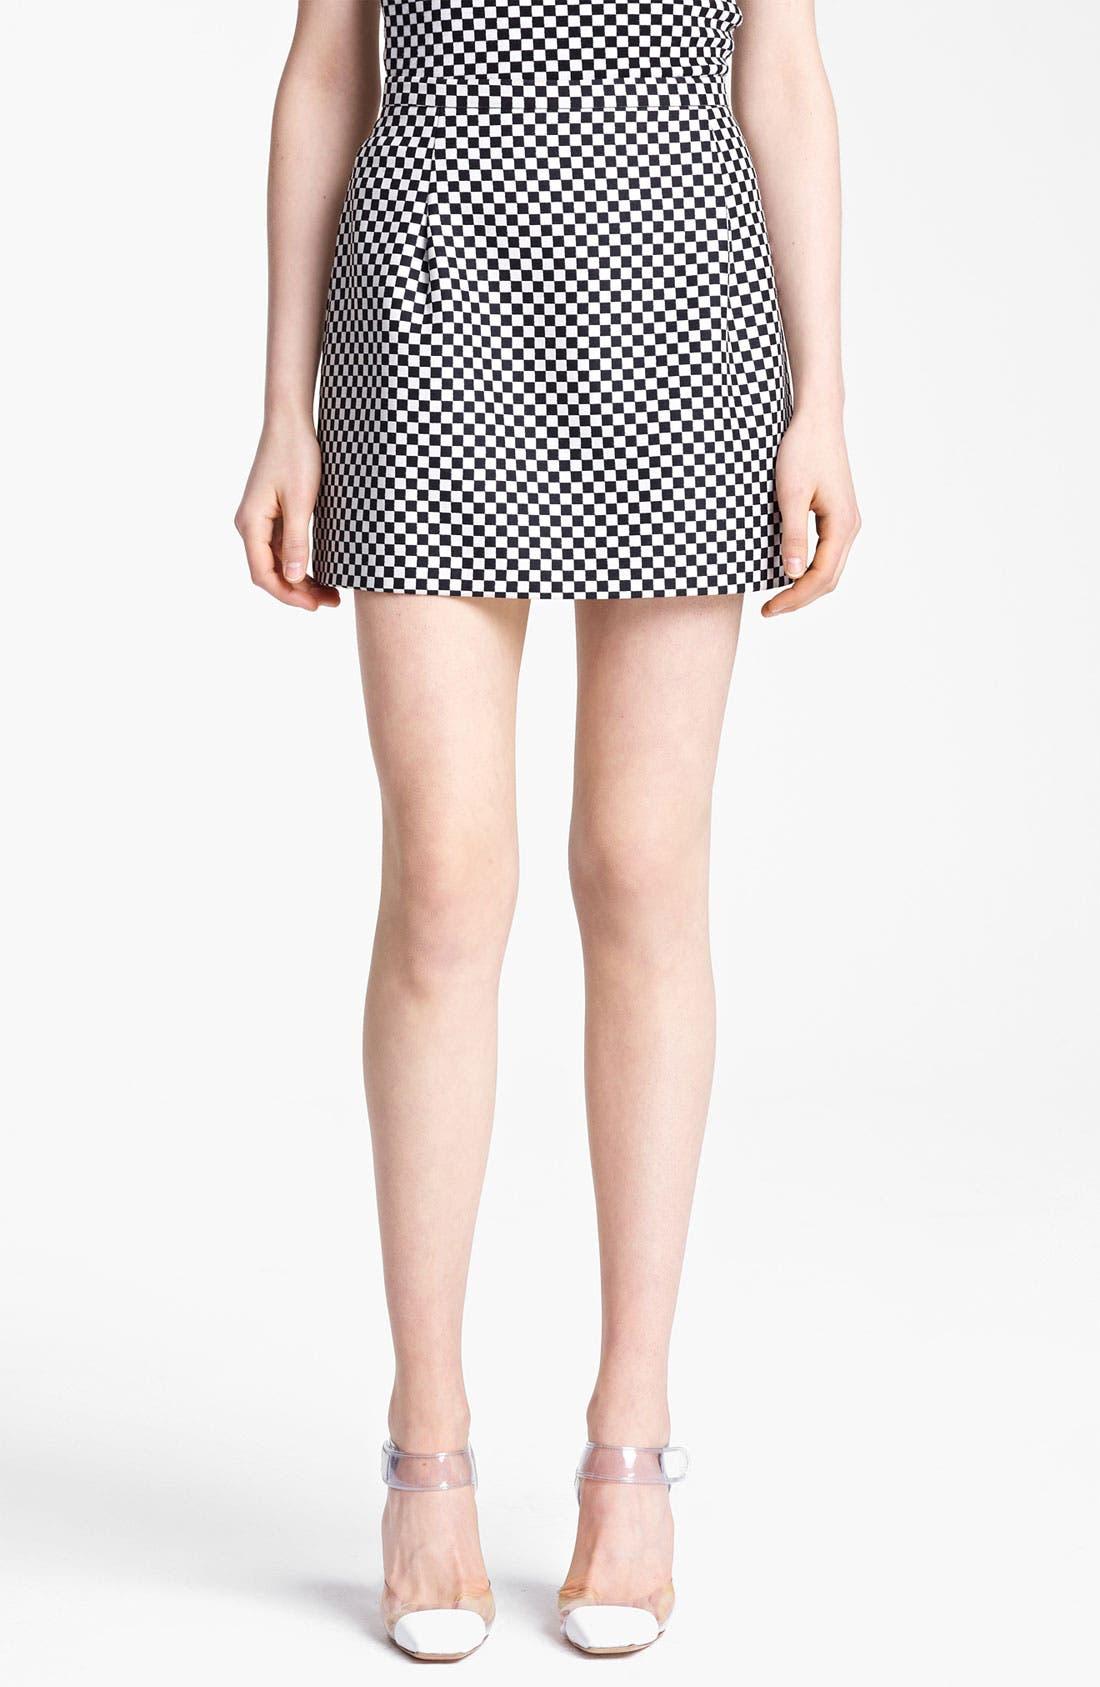 Alternate Image 1 Selected - Michael Kors Optic Check Jacquard Miniskirt